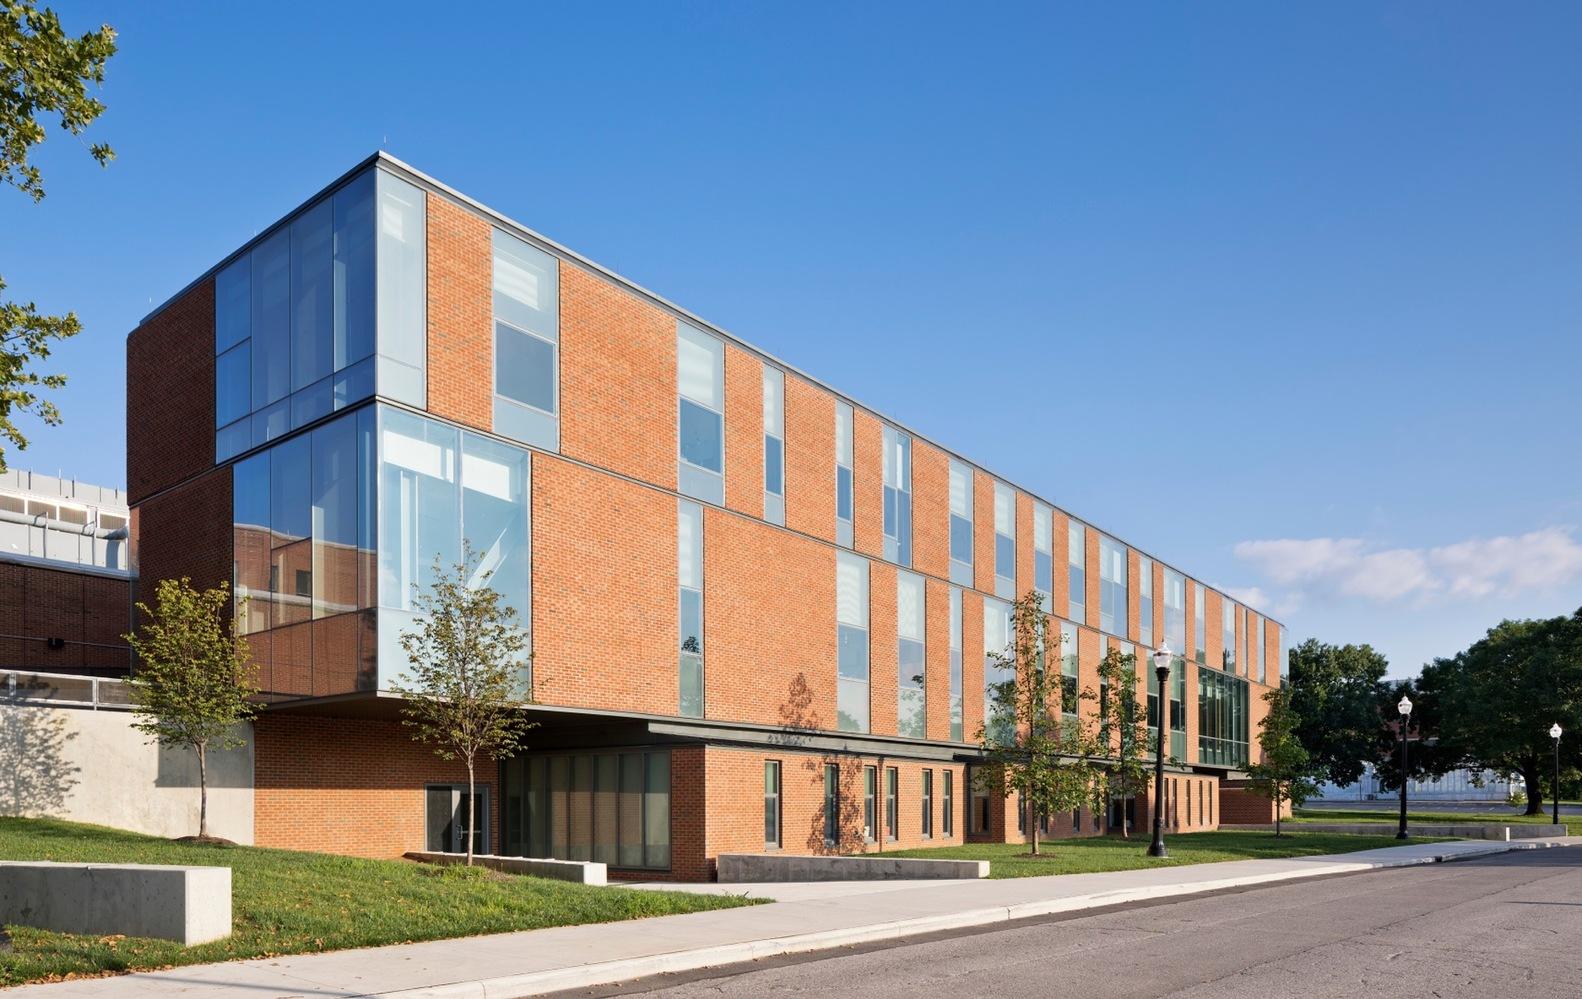 2018 Brick In Architecture Award Winners Announced